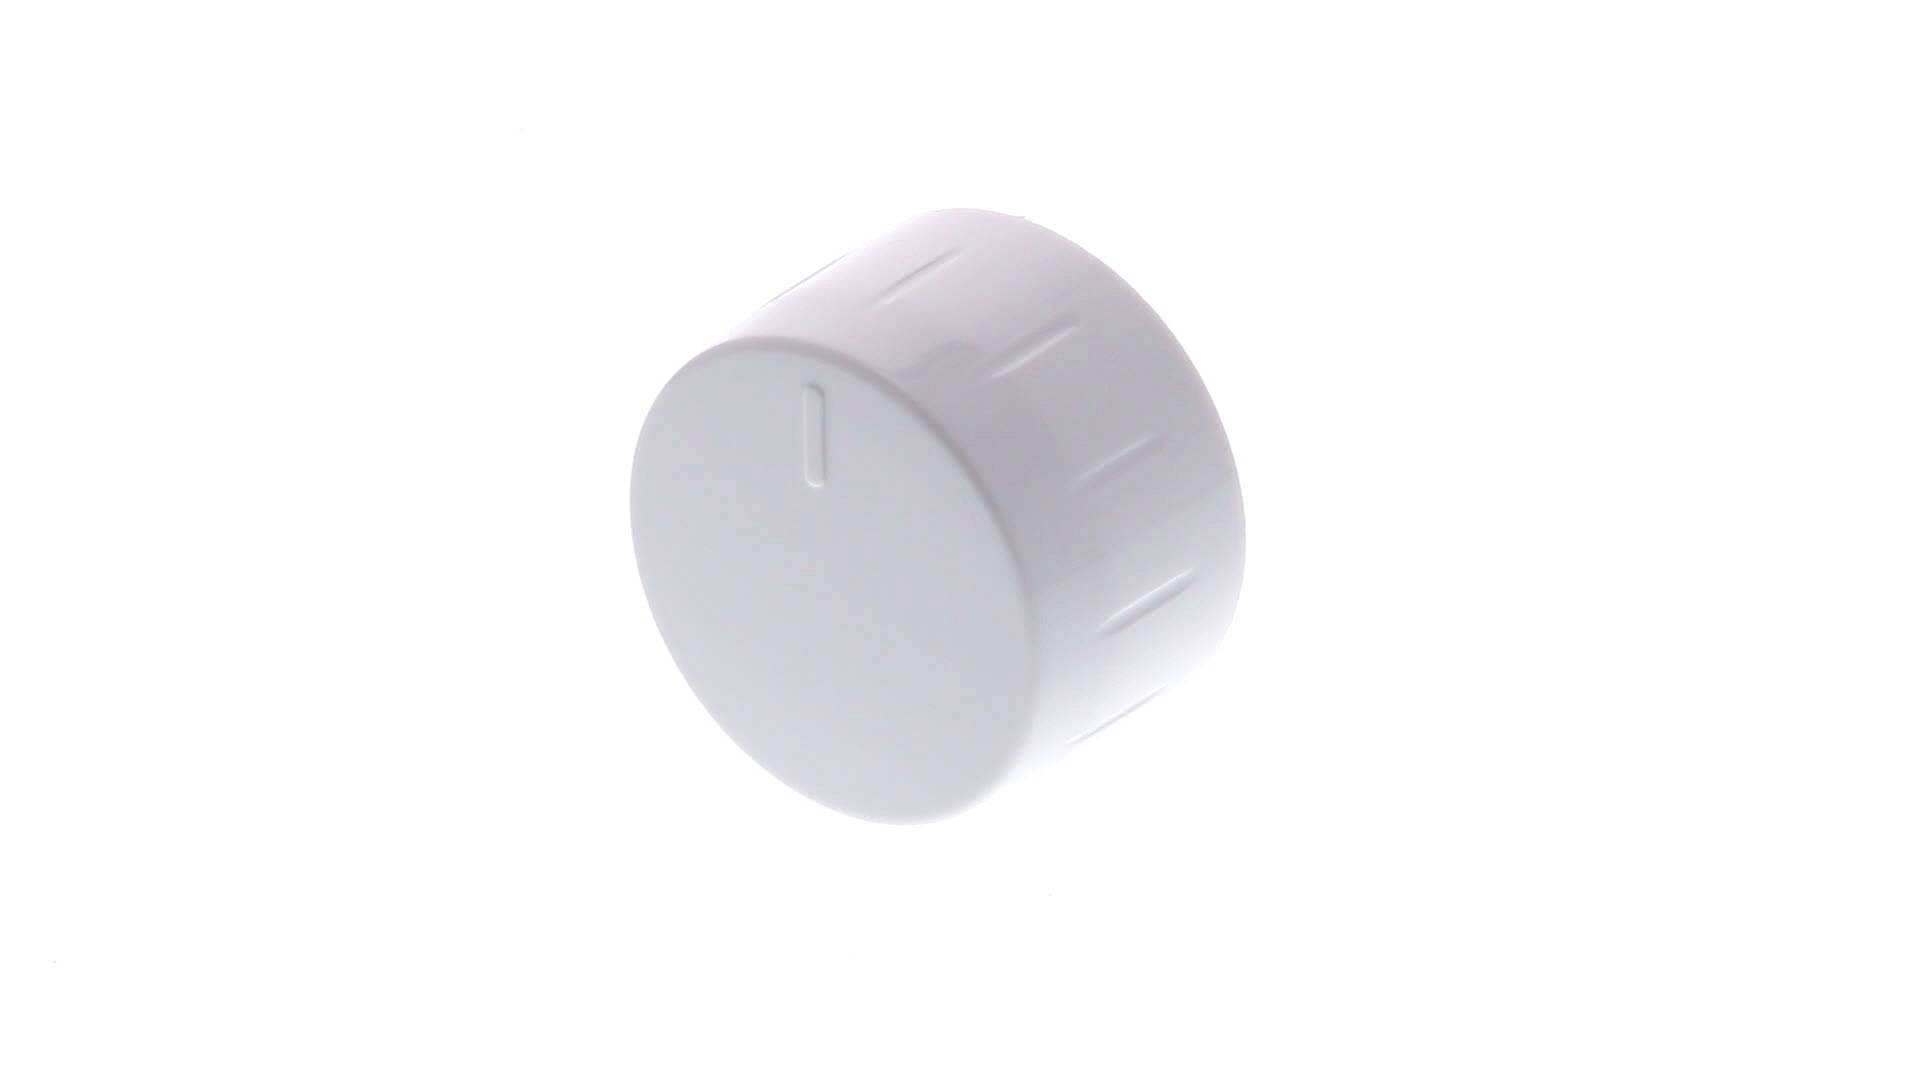 MANETTE CuisiniÈre Blanc OMEGA 37*33 12h 6mm 11mm - 2